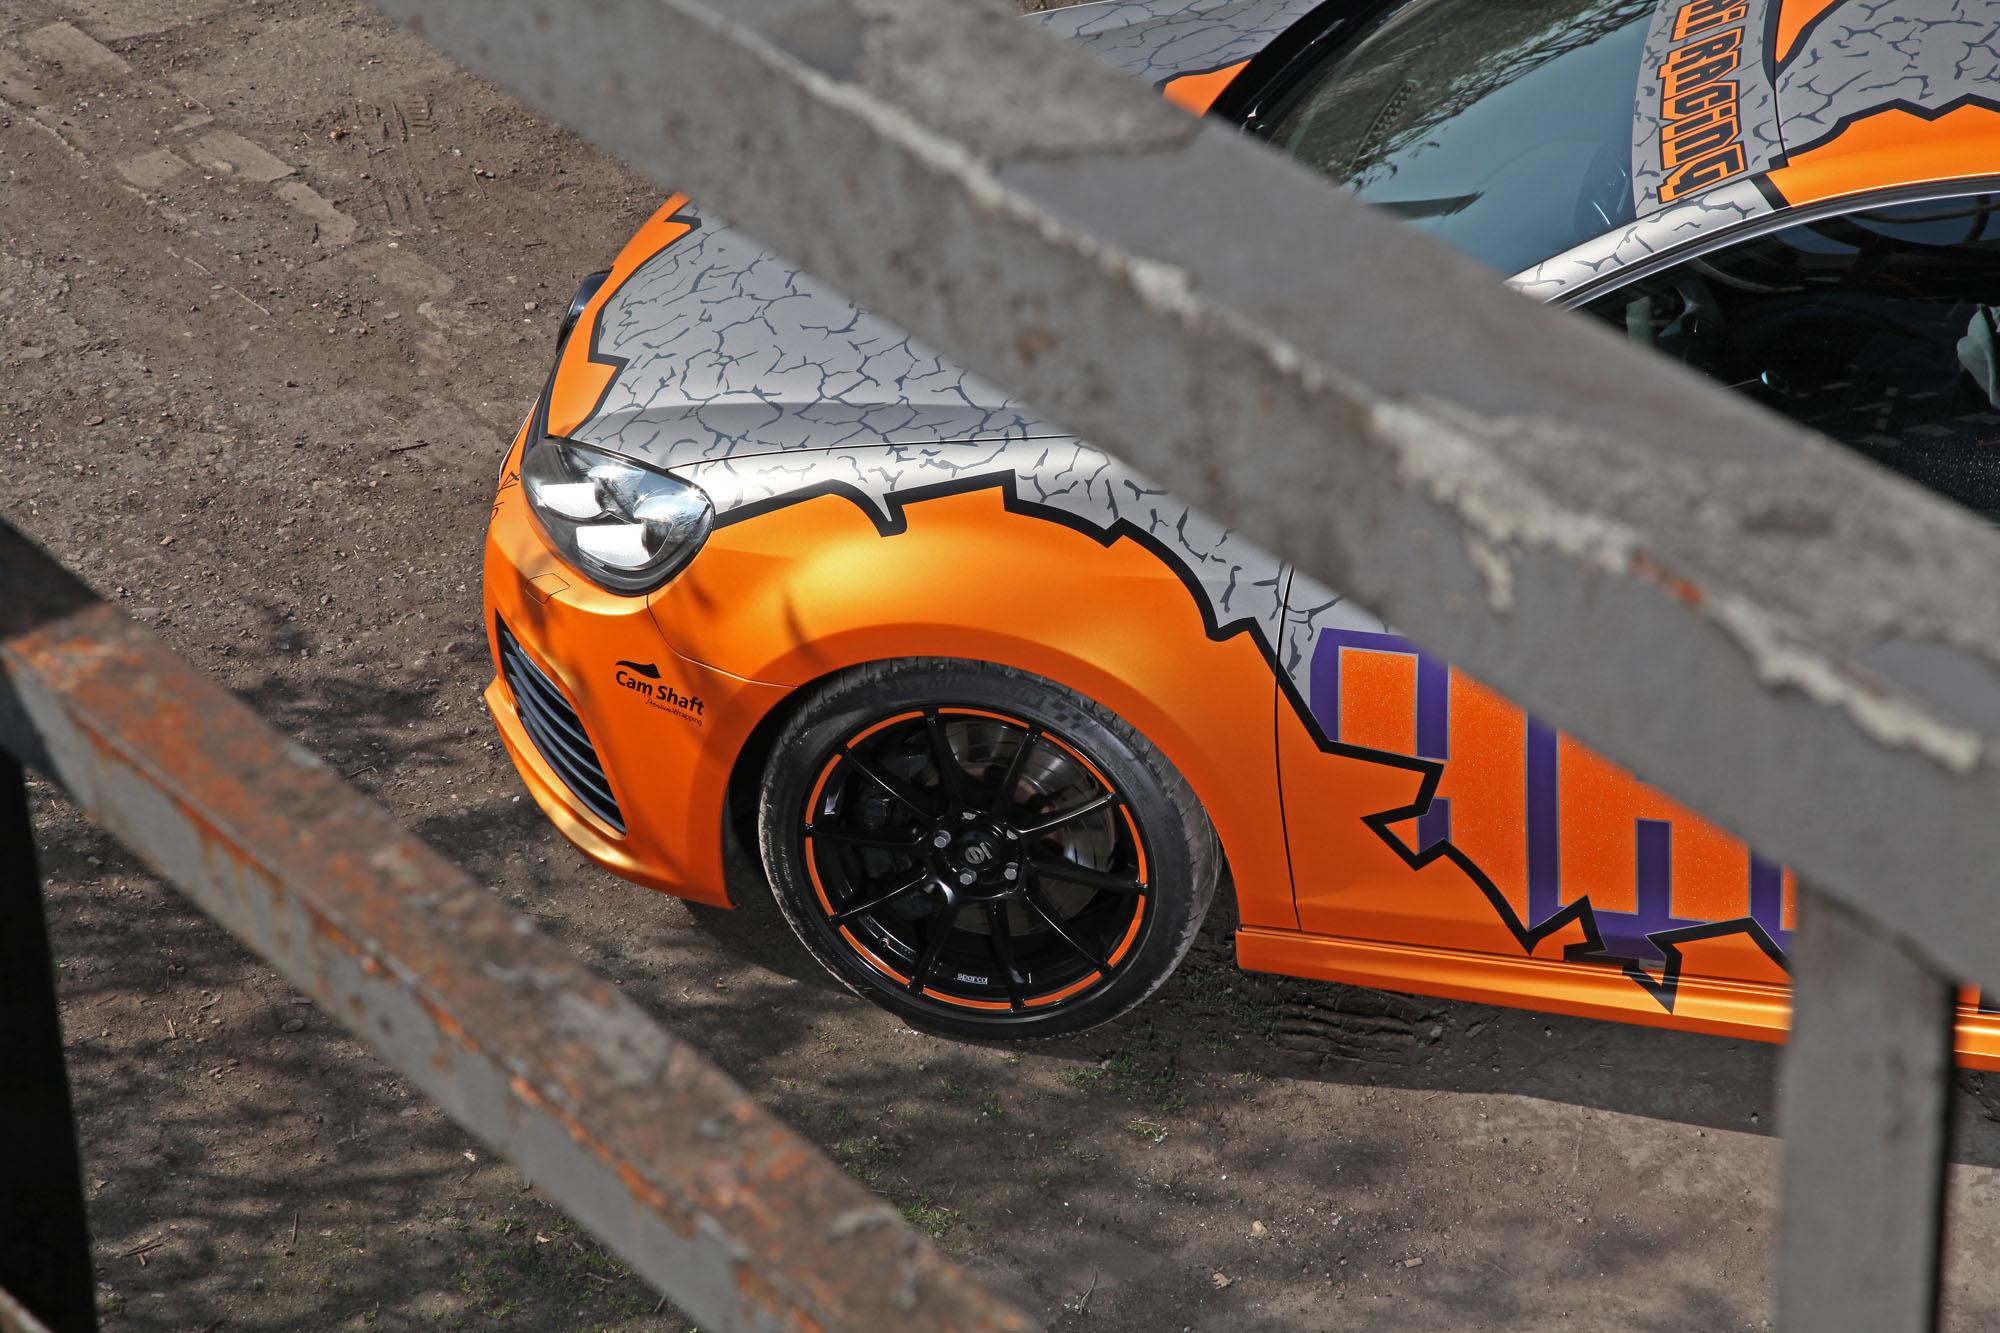 vw-golf-6-r-haiopai-racing-cam-shaft-09